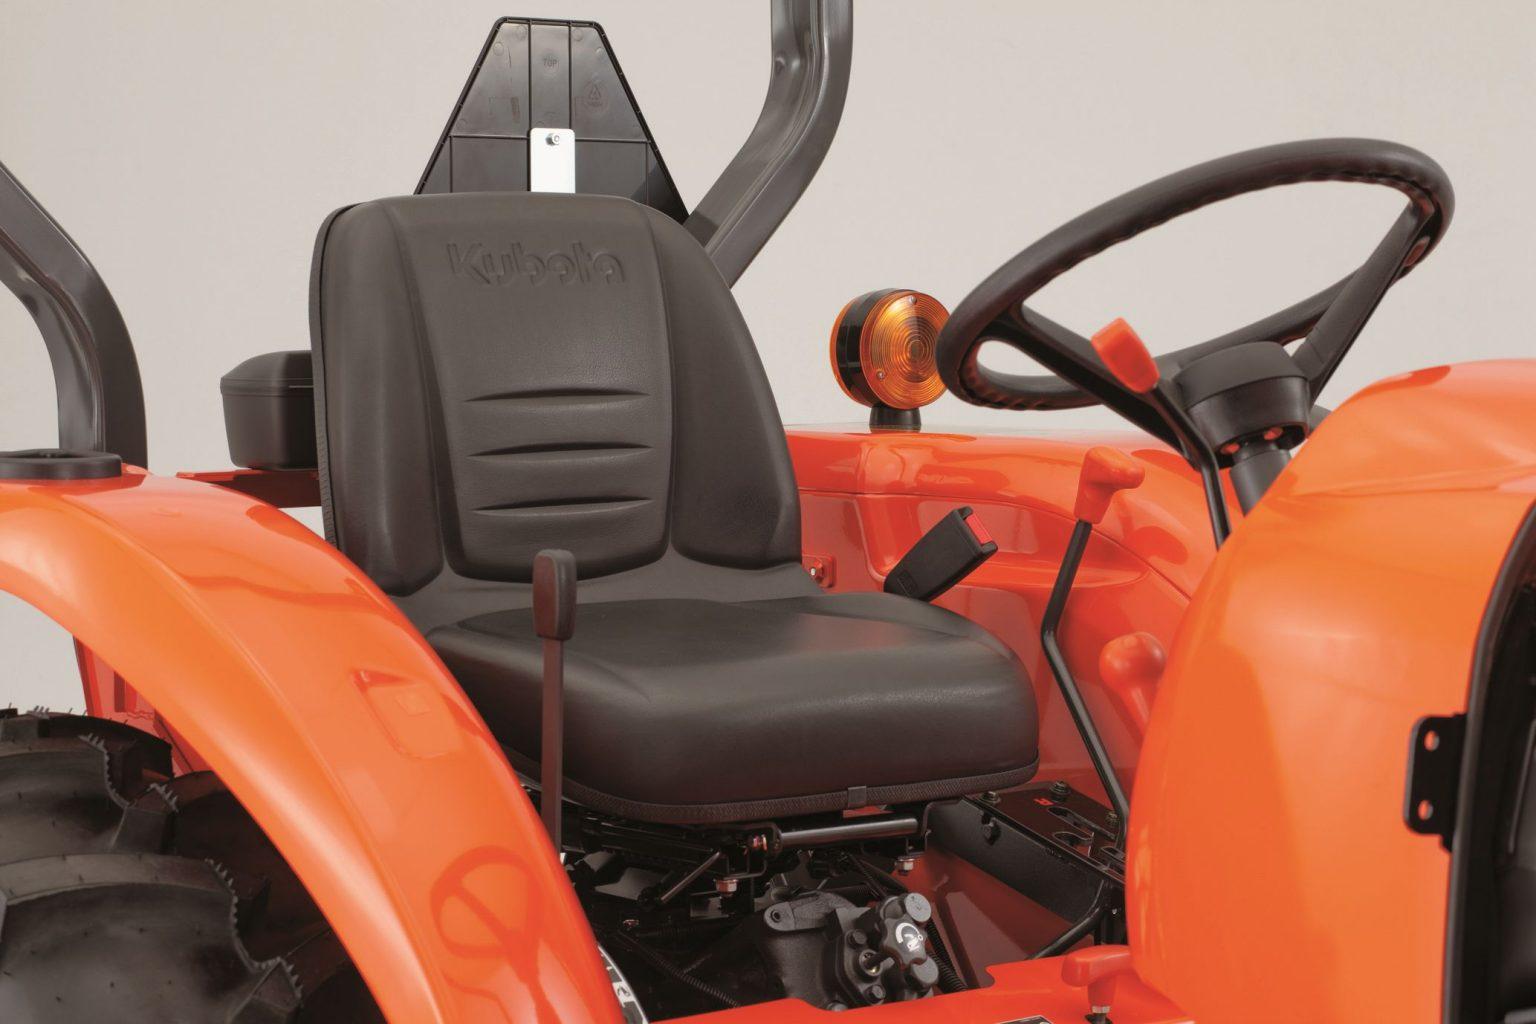 Kubota L3200 Compact Tractor Transmission system